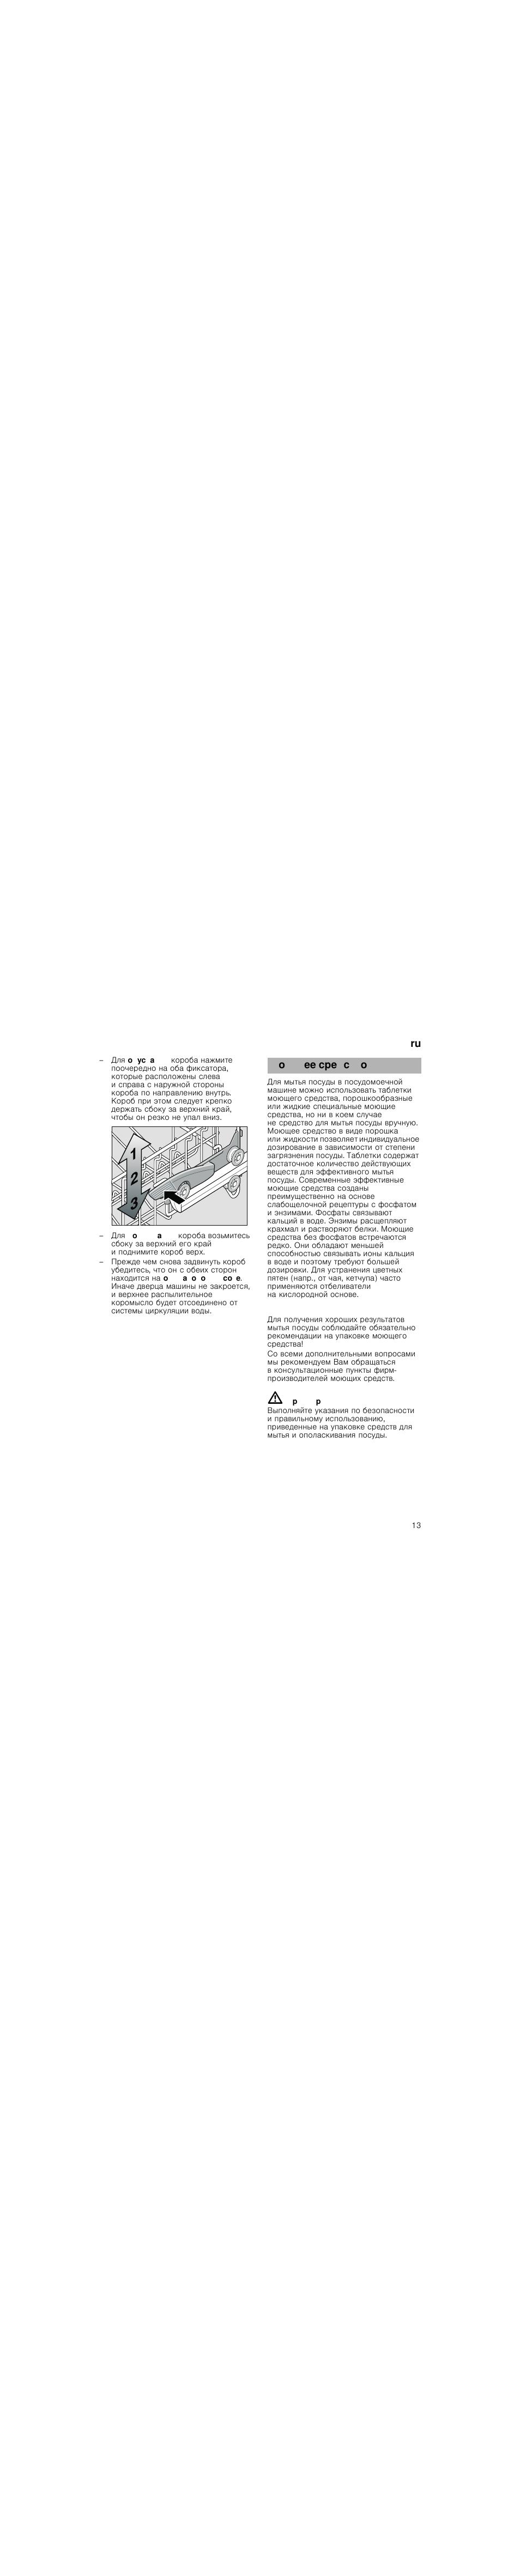 bosch spv 58m00 инструкция по монтажу